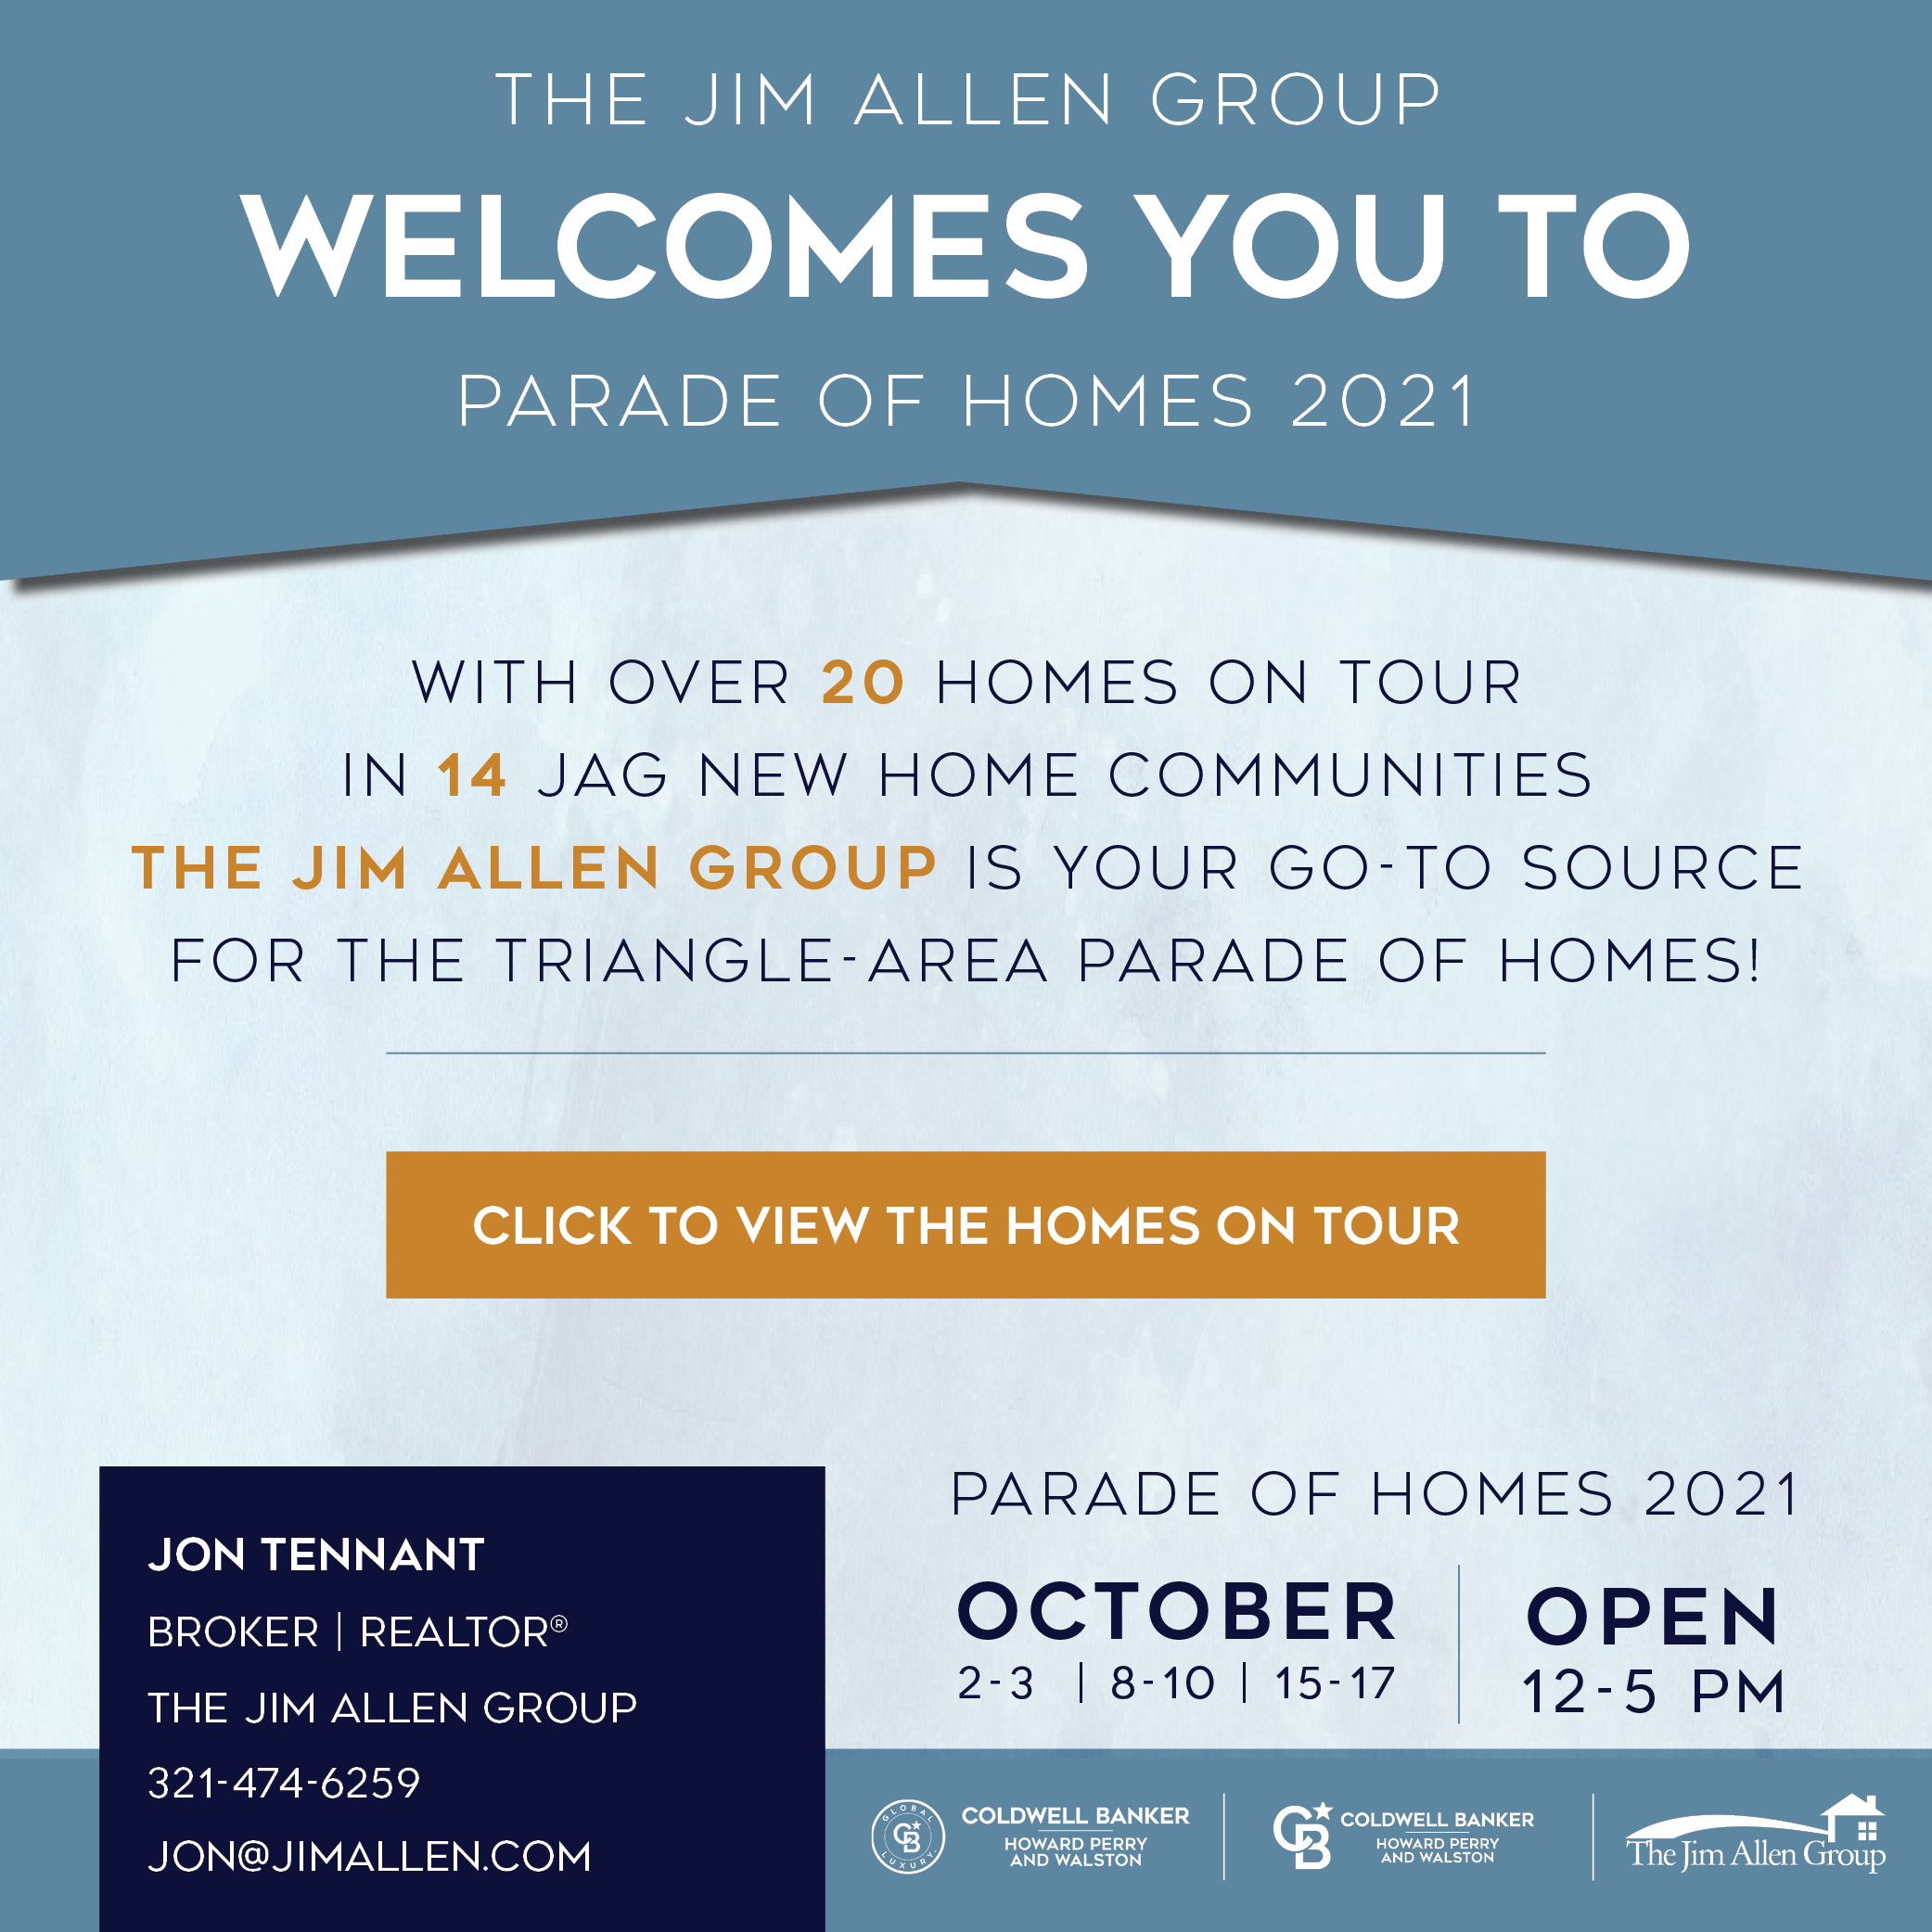 Jon Tennant | Parade of Homes 2021 | The Jim Allen Group